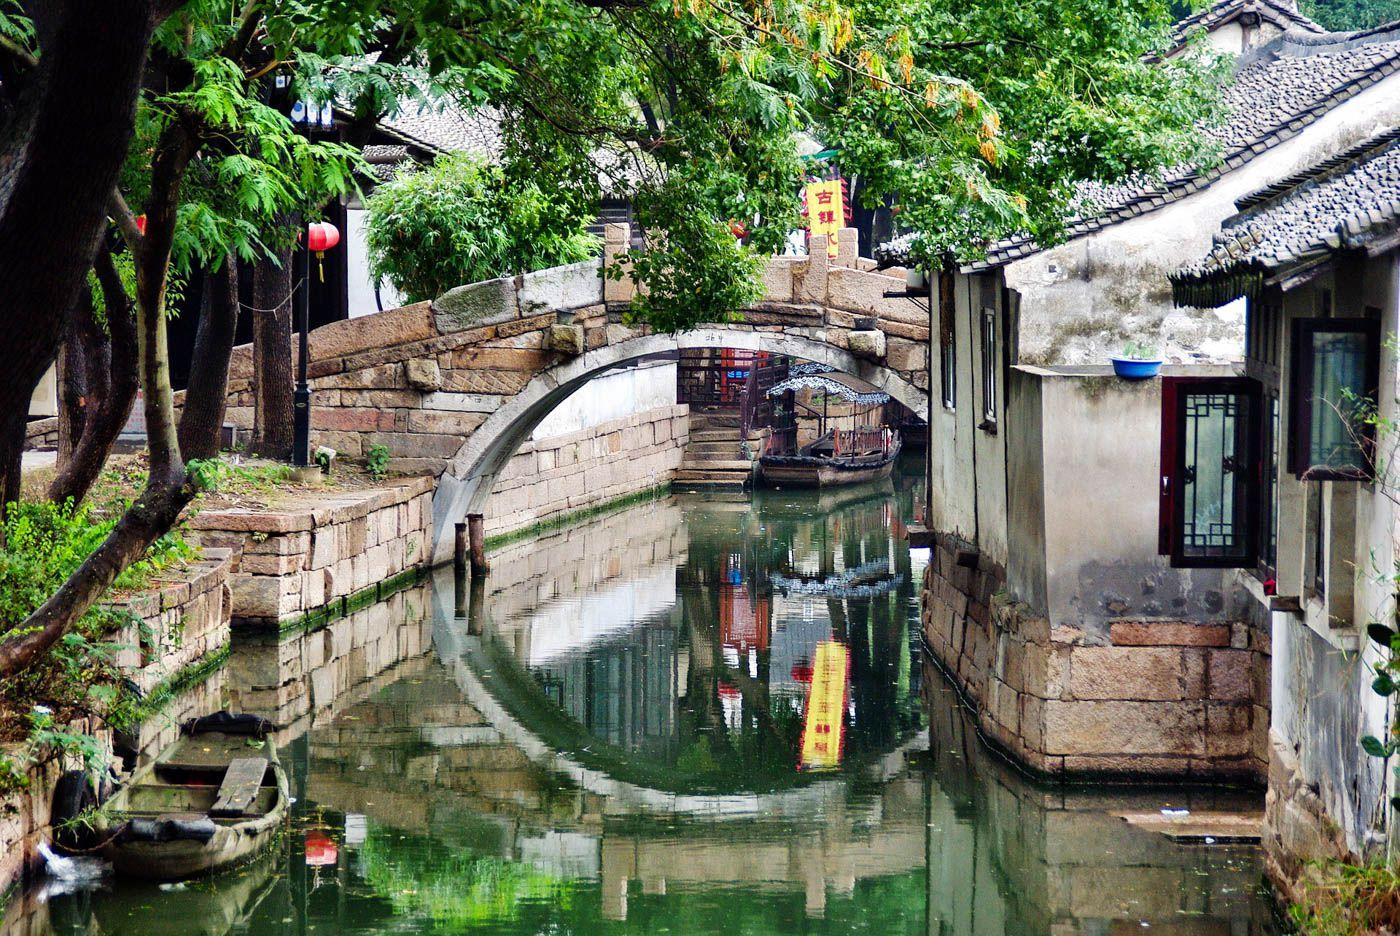 jiangsu travel costs  u0026 prices